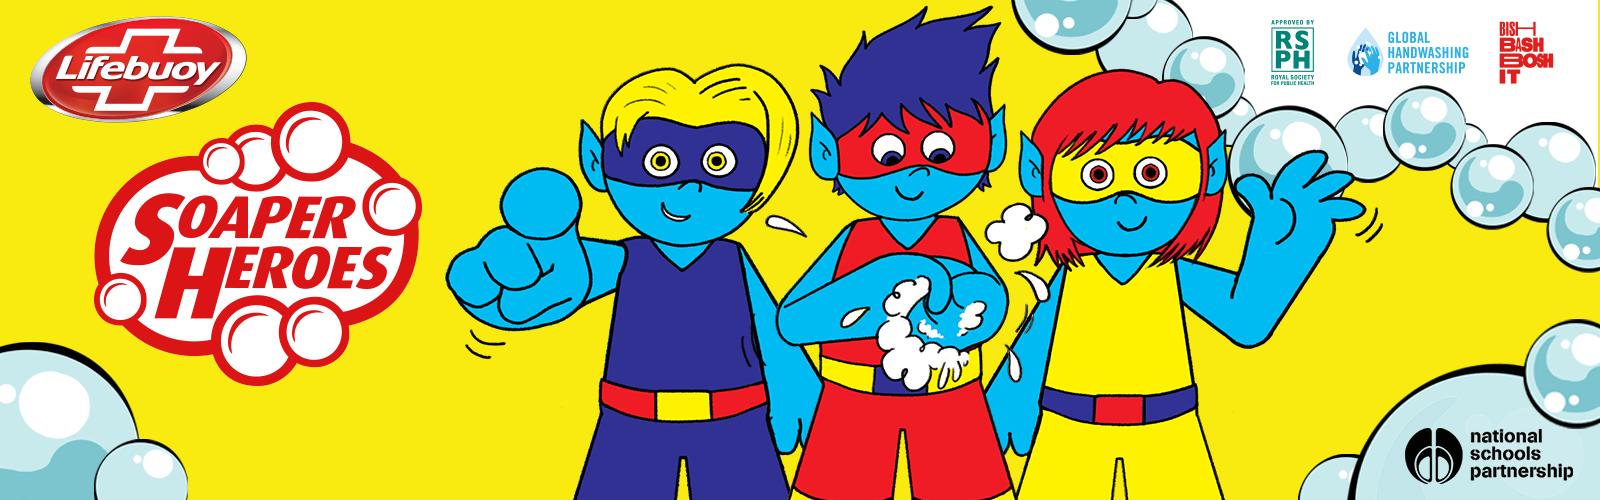 Lifebuoy's Soaper Heroes